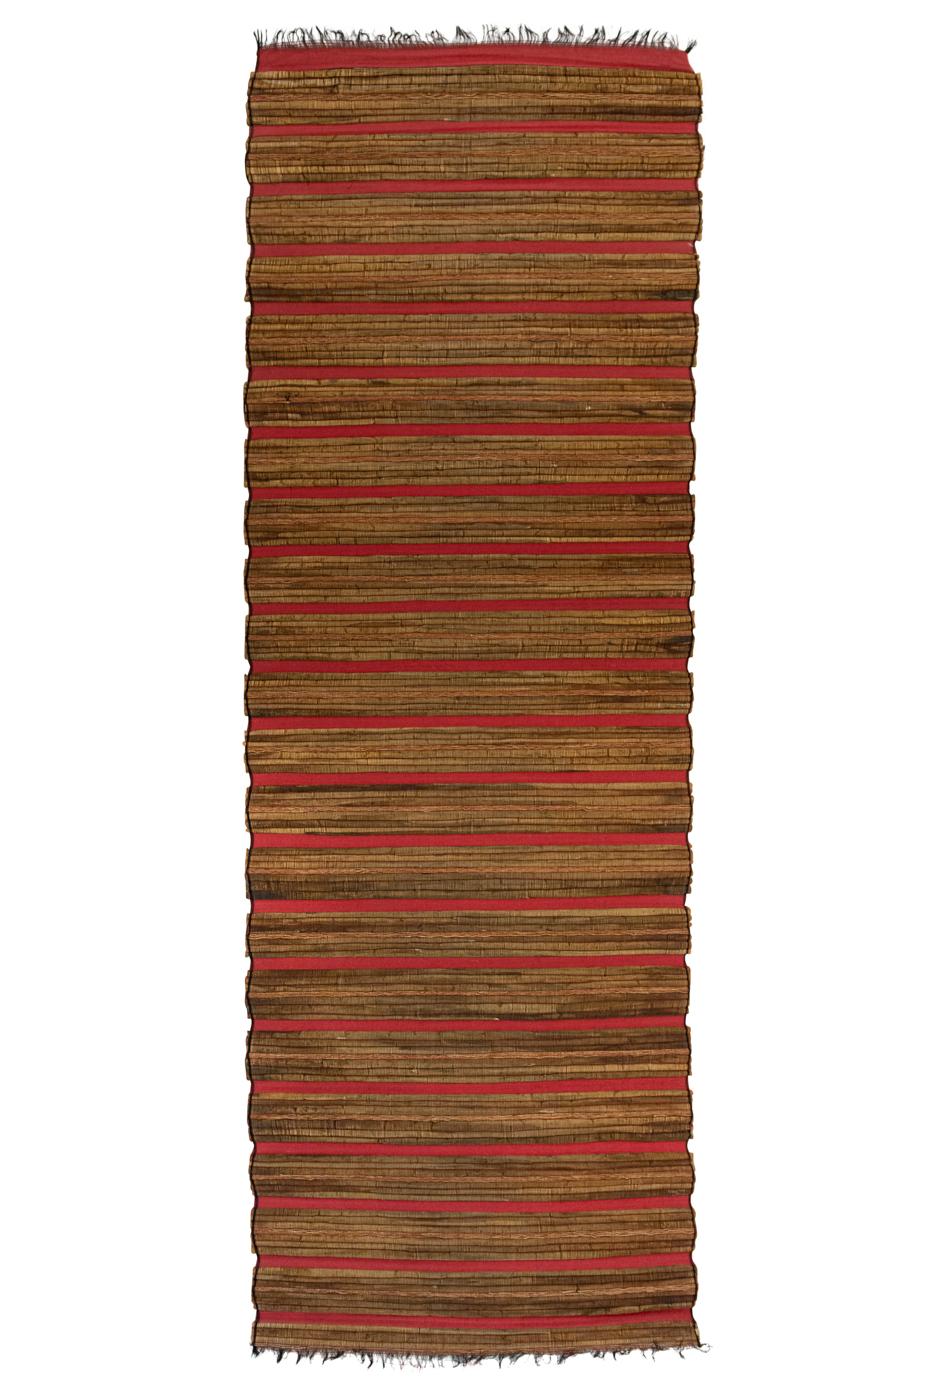 Brown-red bamboo matting